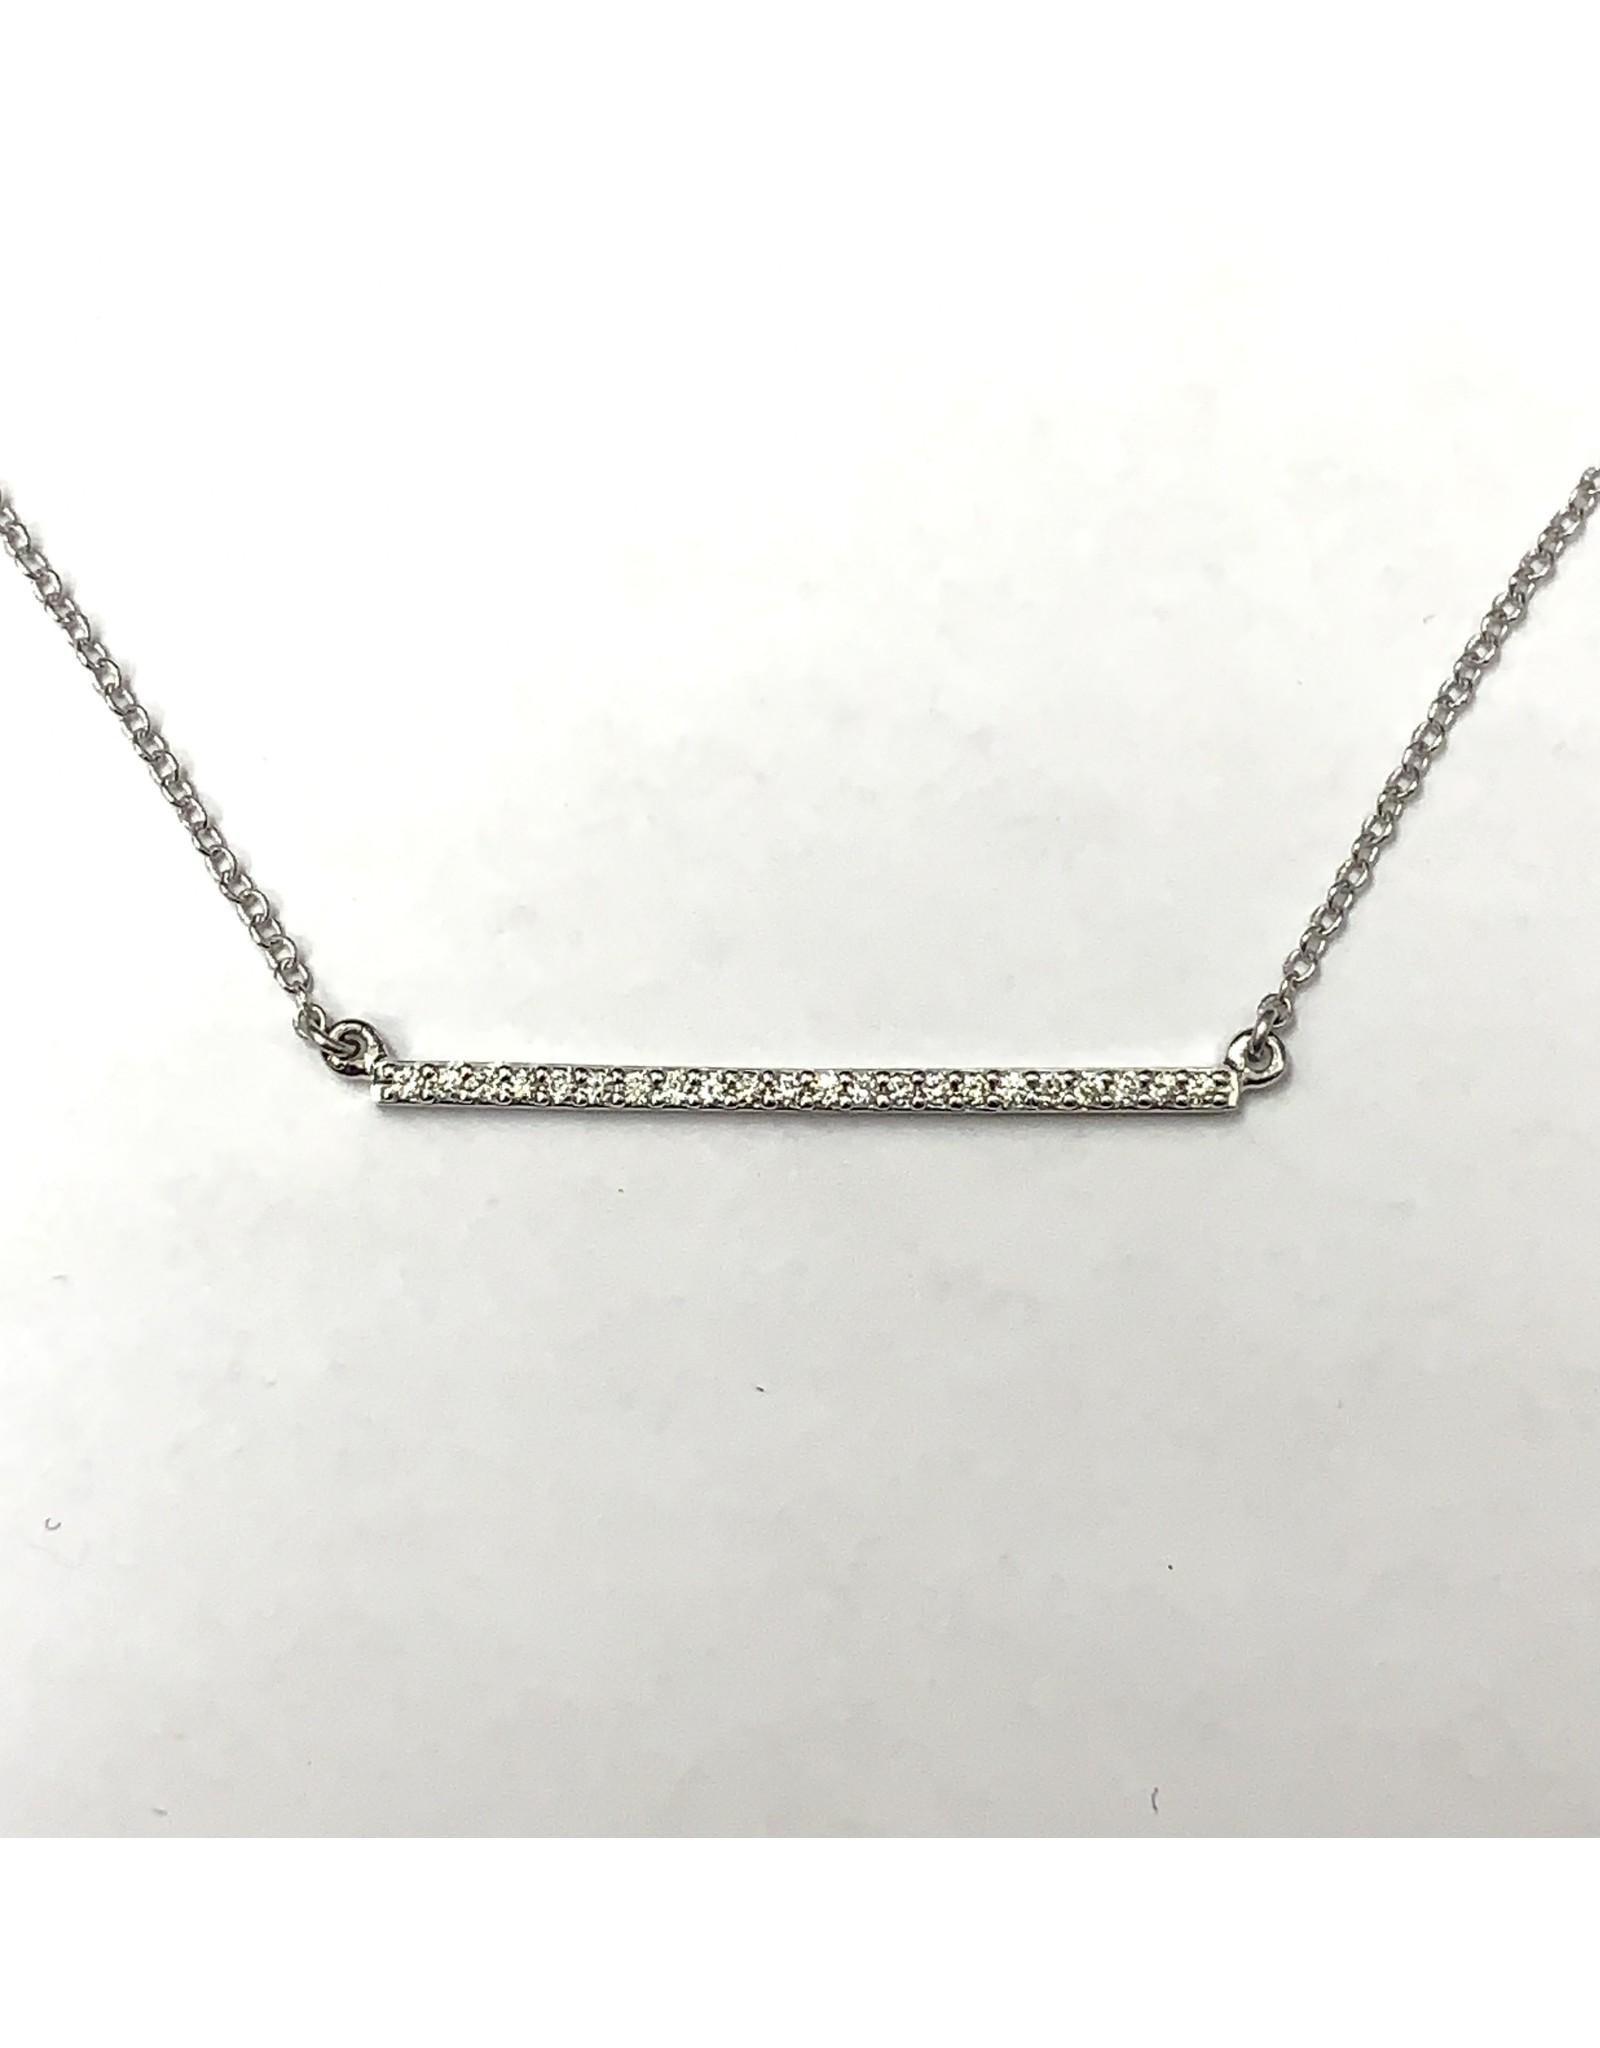 Diamond Bar Necklace 10KW